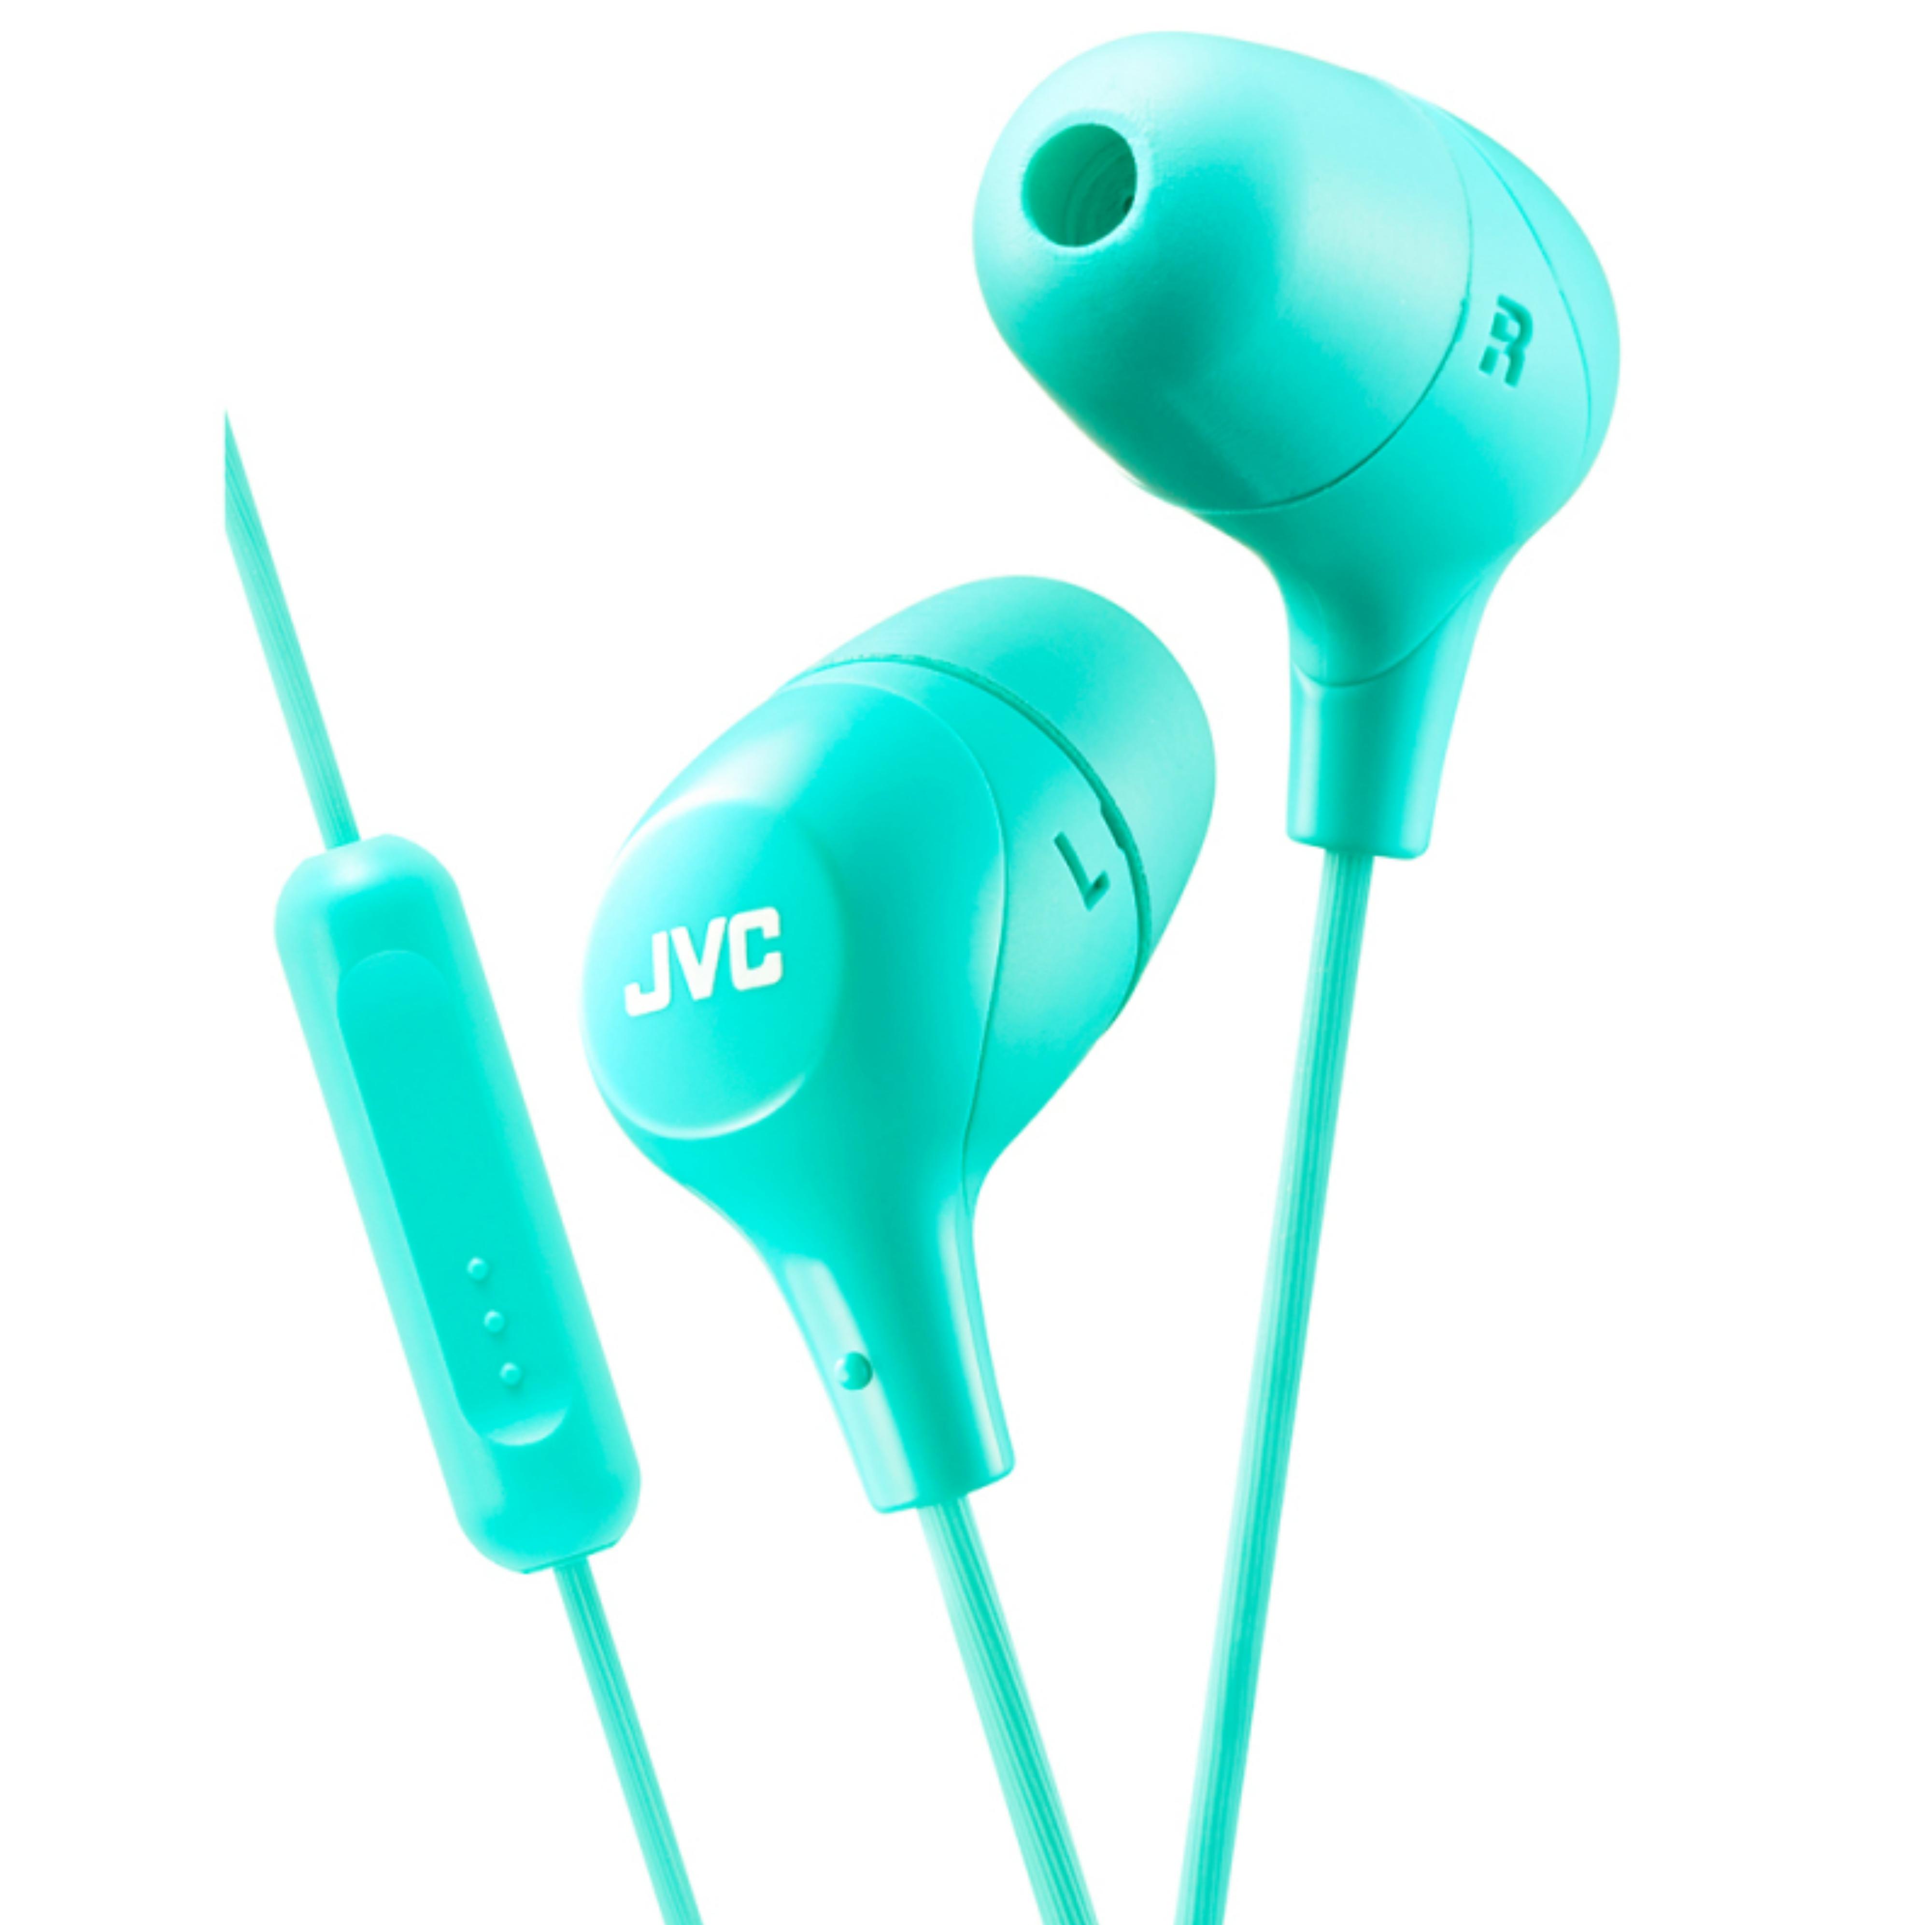 JVC HAFX38MG New Marshmallow Headphones|Custom Fit?In Ear|Remote & Mic|Green?